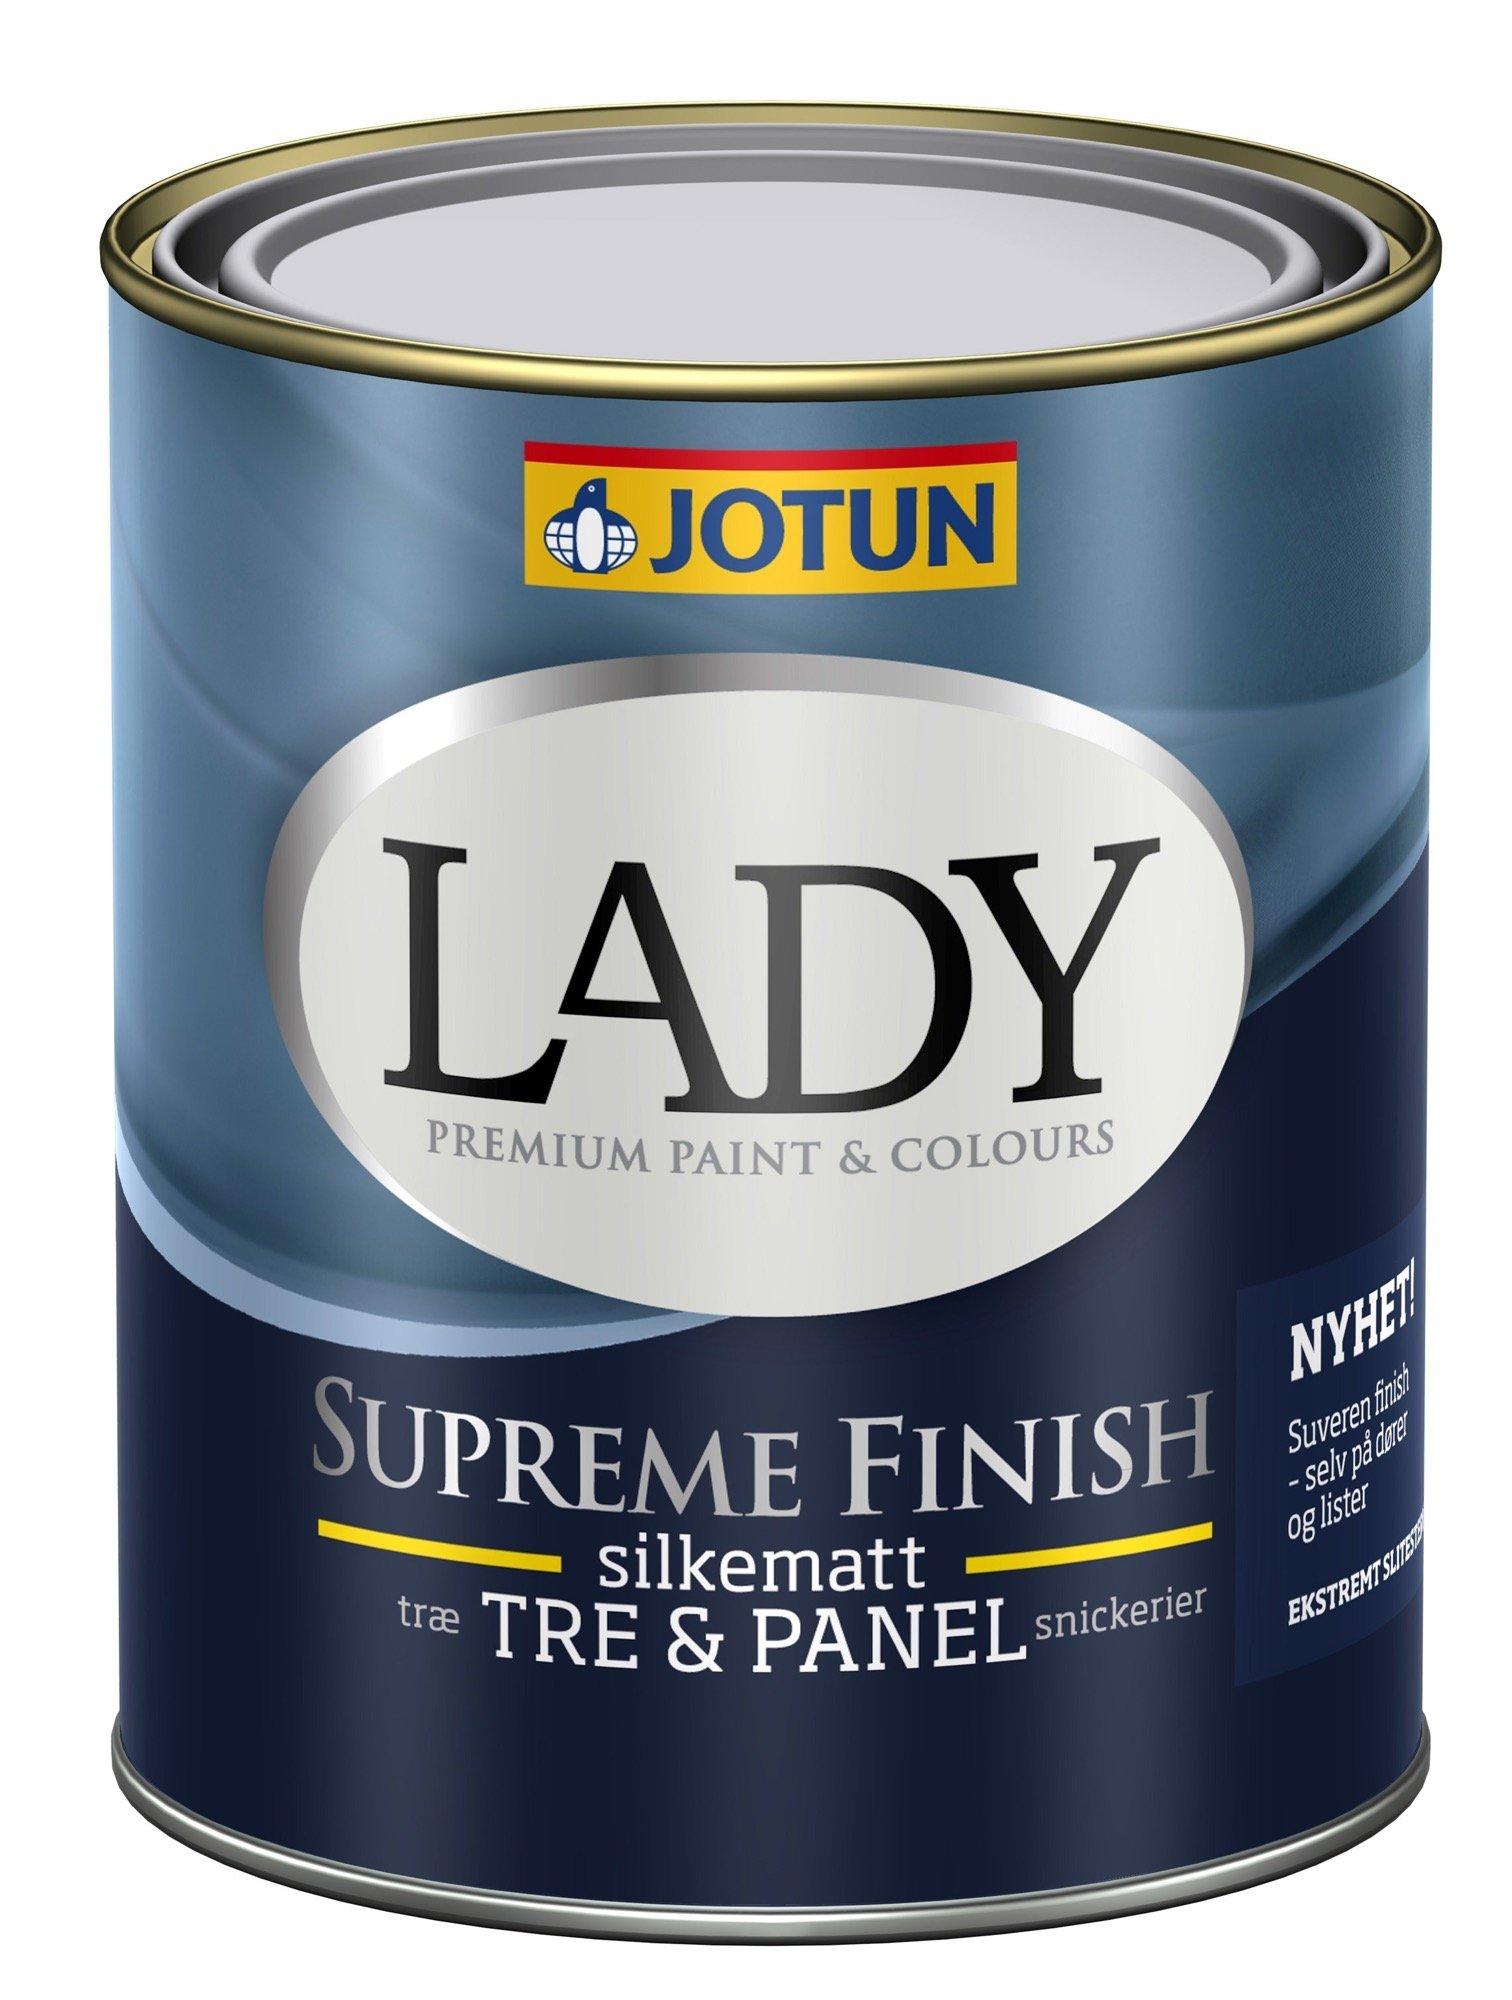 LADY Supreme Finish Silkemat glans 15 - 2,7 L